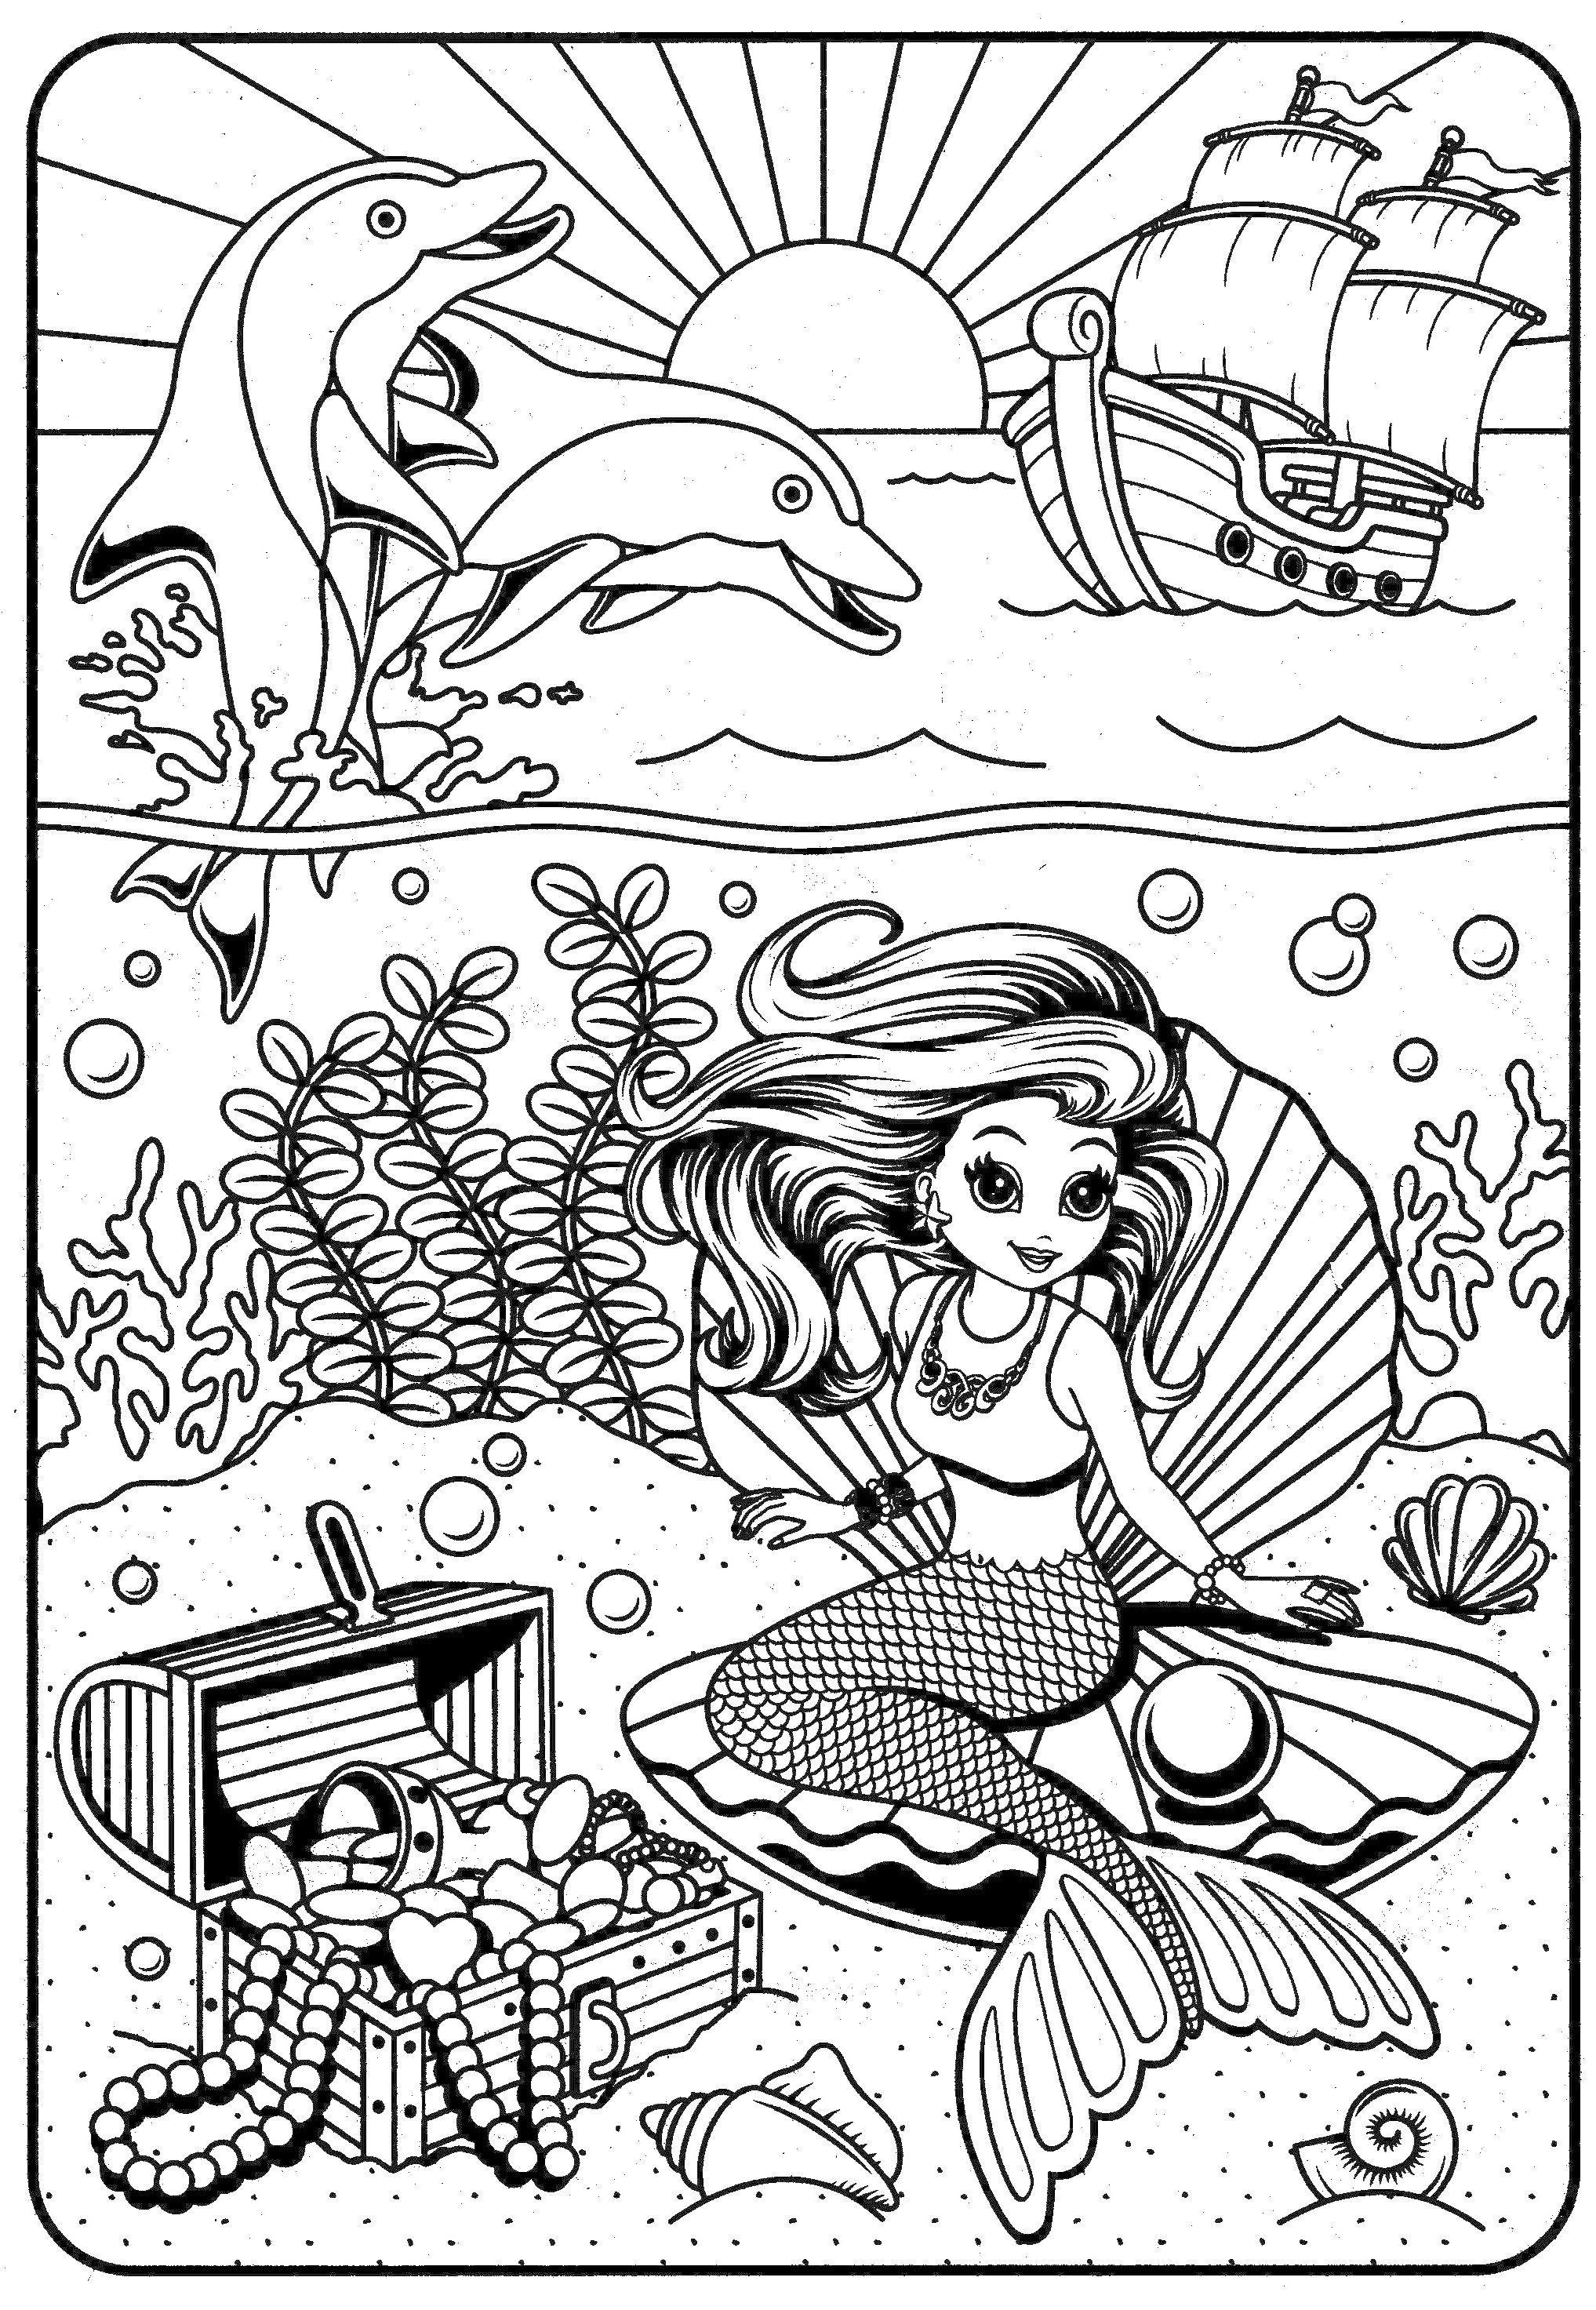 Lisa Frank Coloring Pages Coloring Mermaid Coloring Lisa Frank Coloring Books Lisa Frank Coloring Pages Coloring Pages Lisa Frank